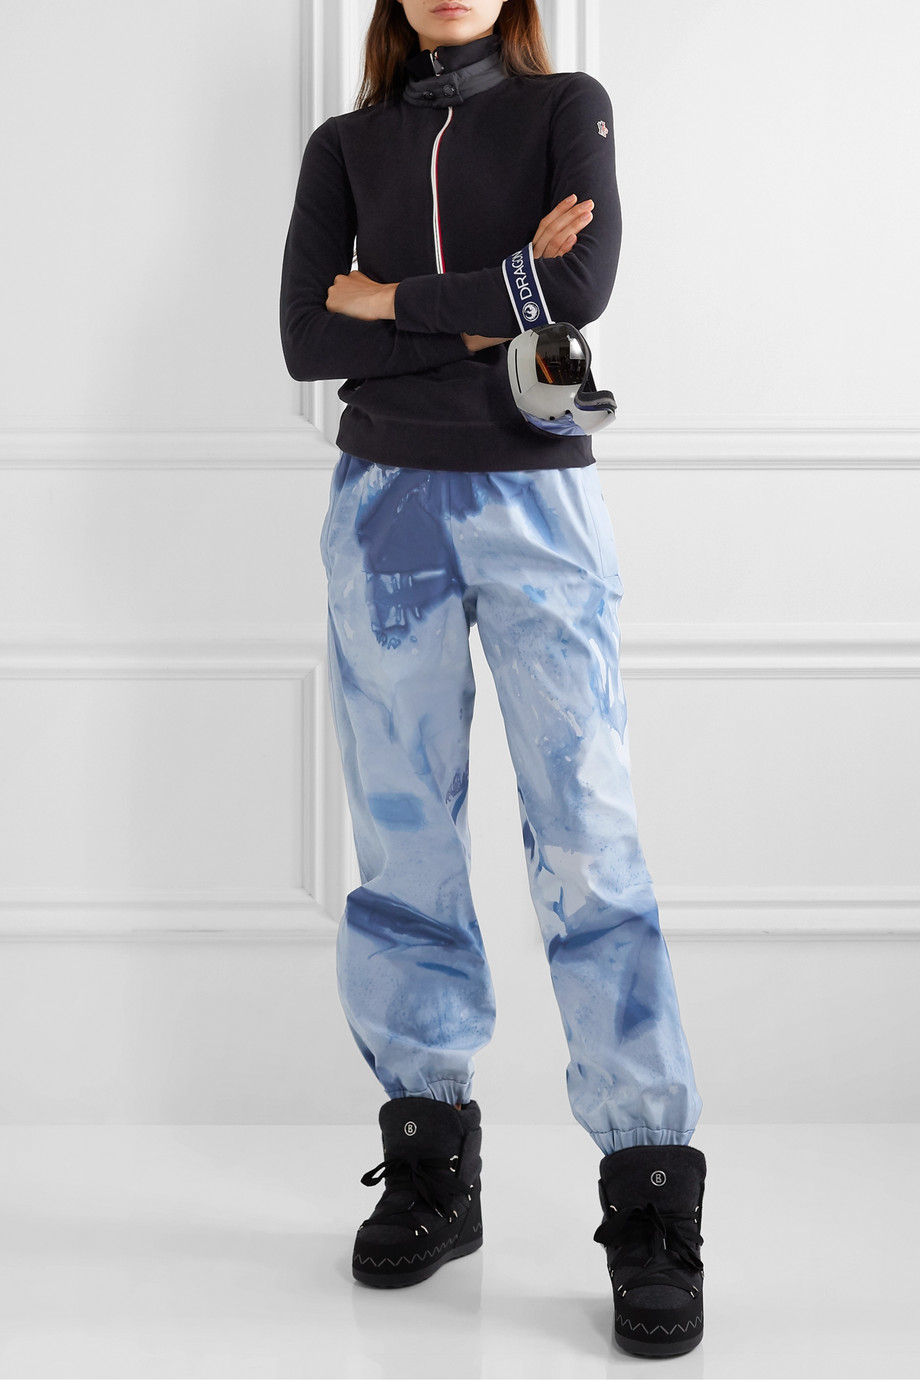 Moncler Genius + 3 Moncler Grenoble tie-dyed tapered ski pants